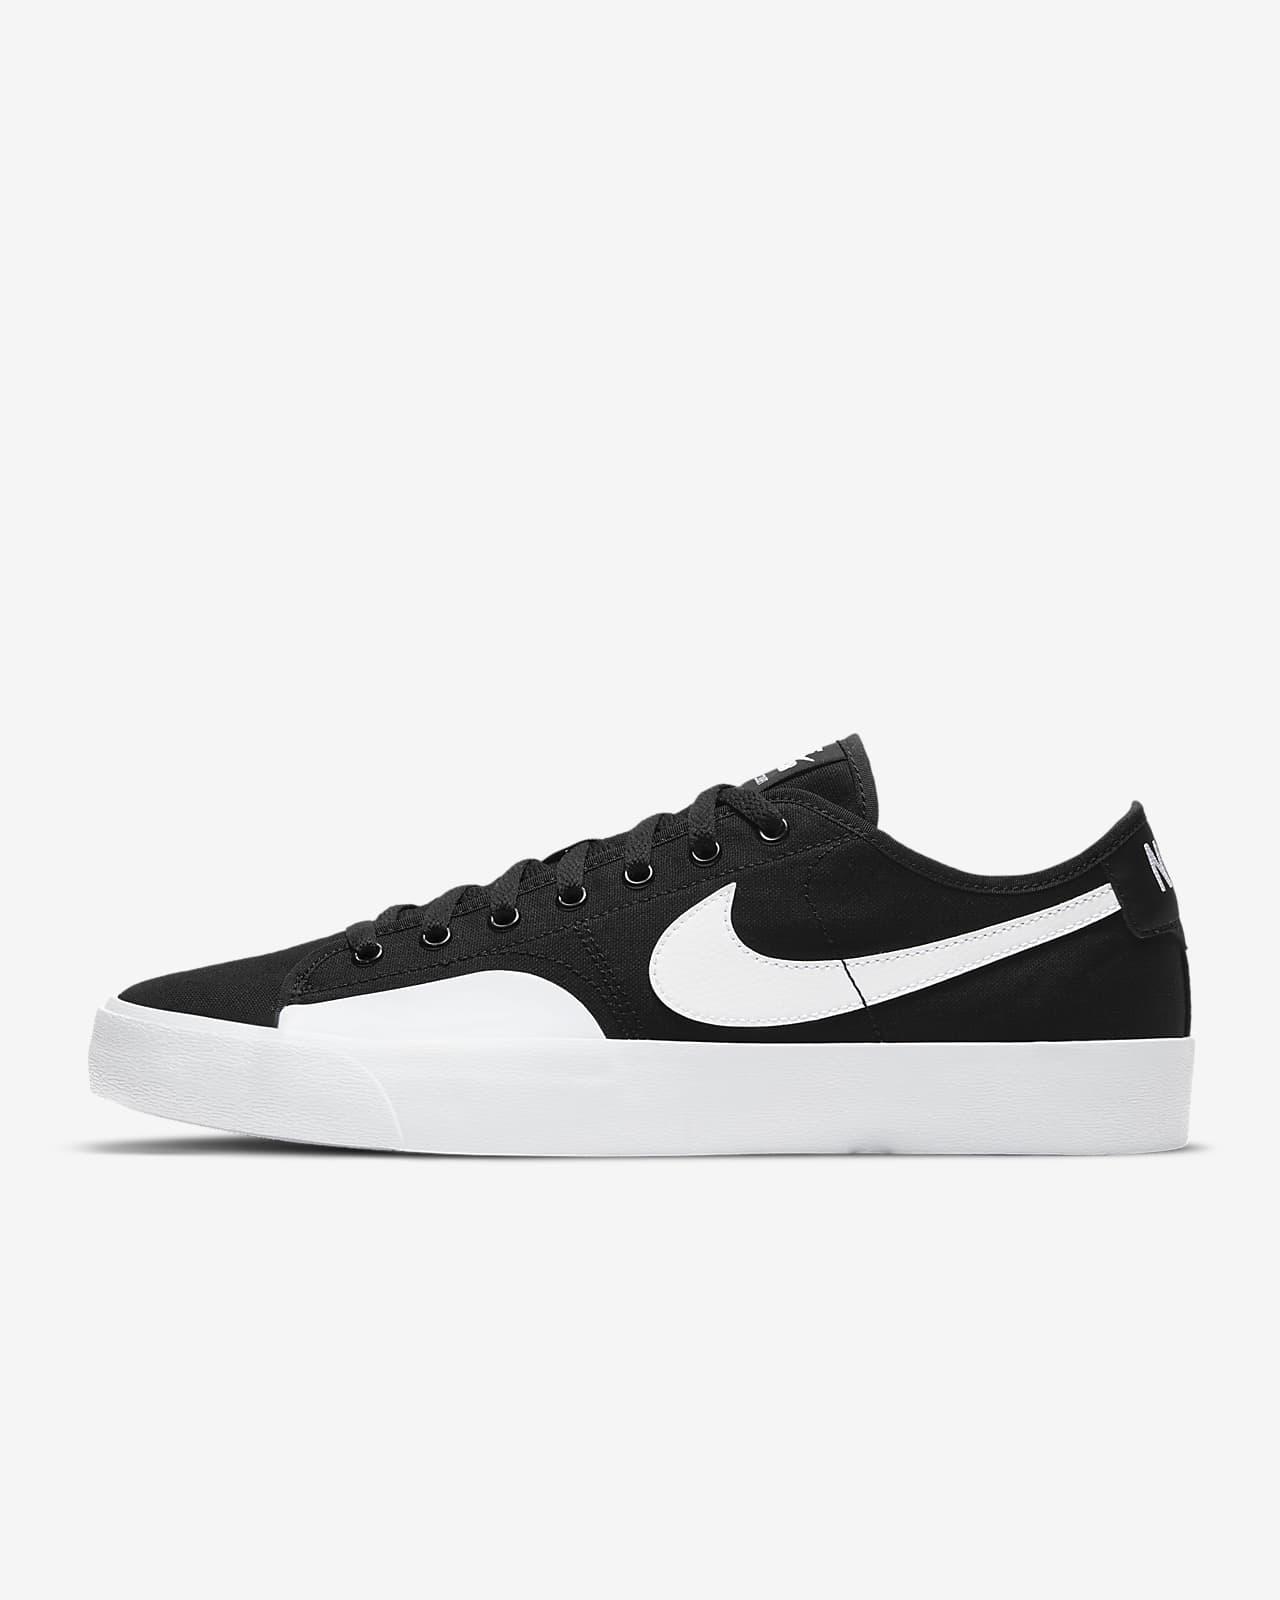 Nike SB BLZR Court Skate Shoes. Nike LU